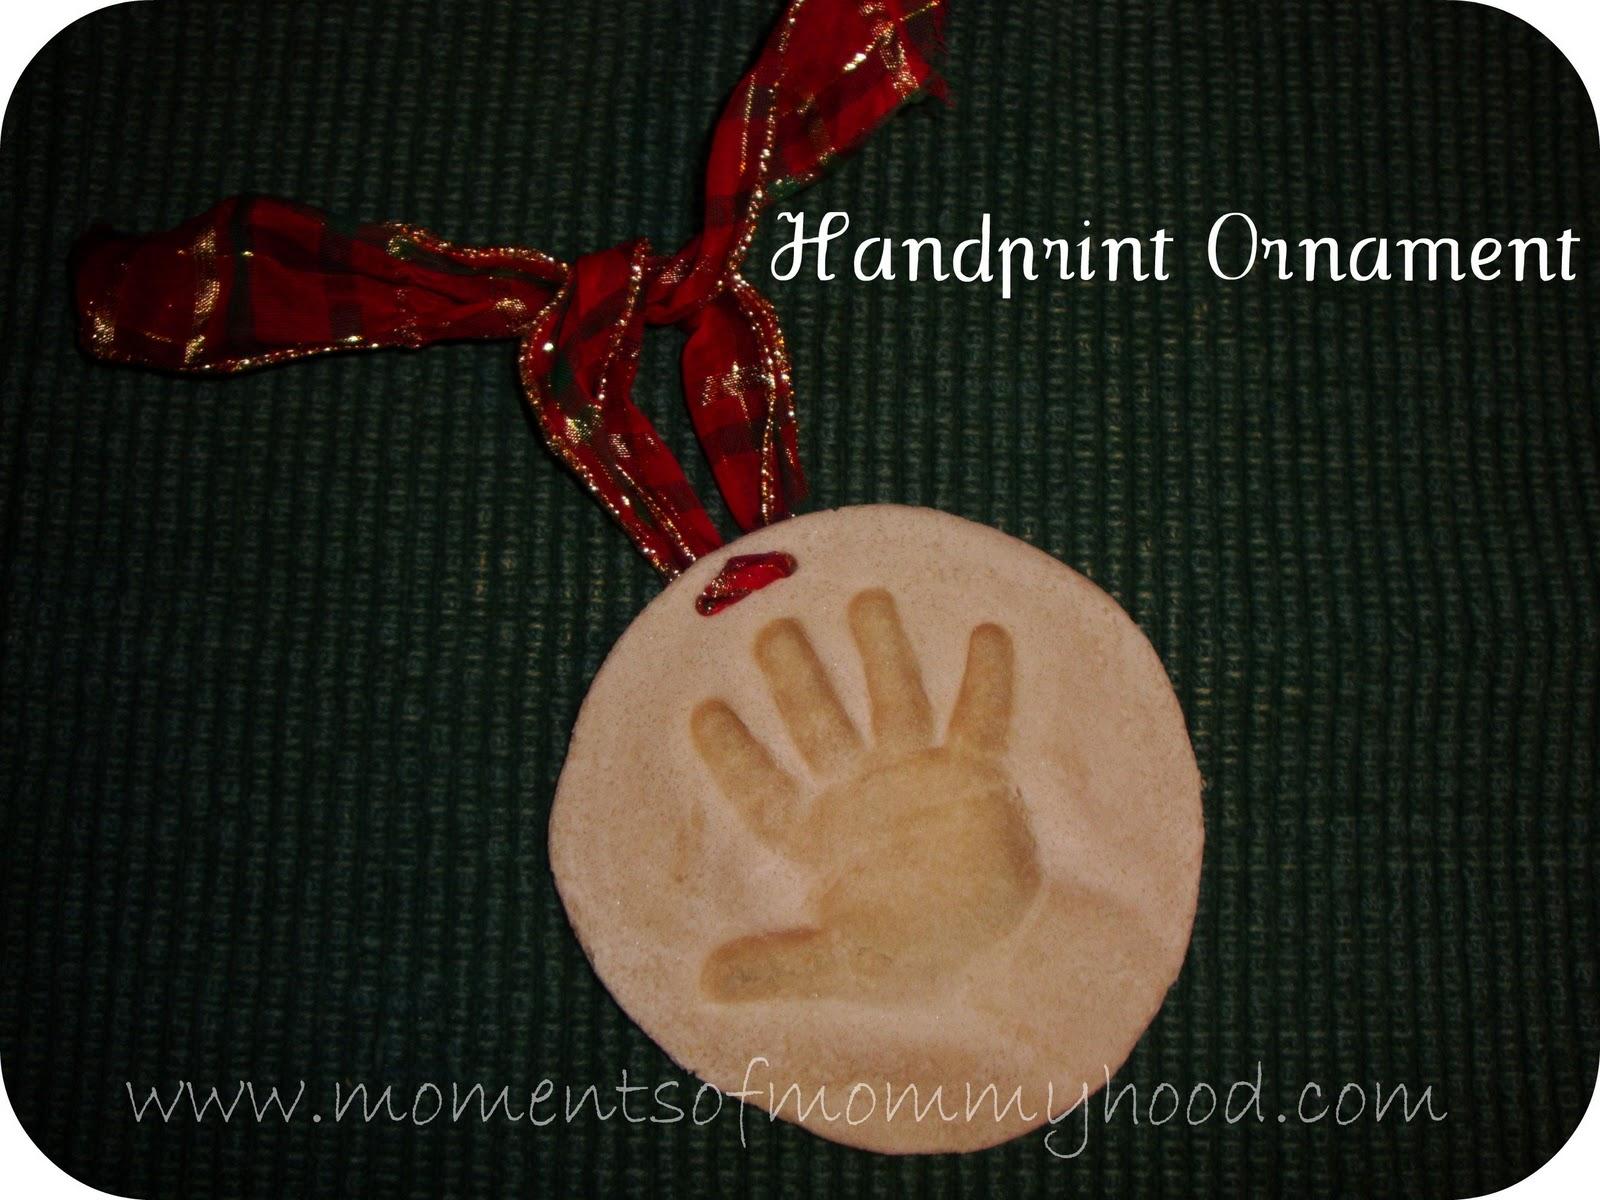 Moments of mommyhood keepsake ornament keepsake ornament handprint solutioingenieria Images